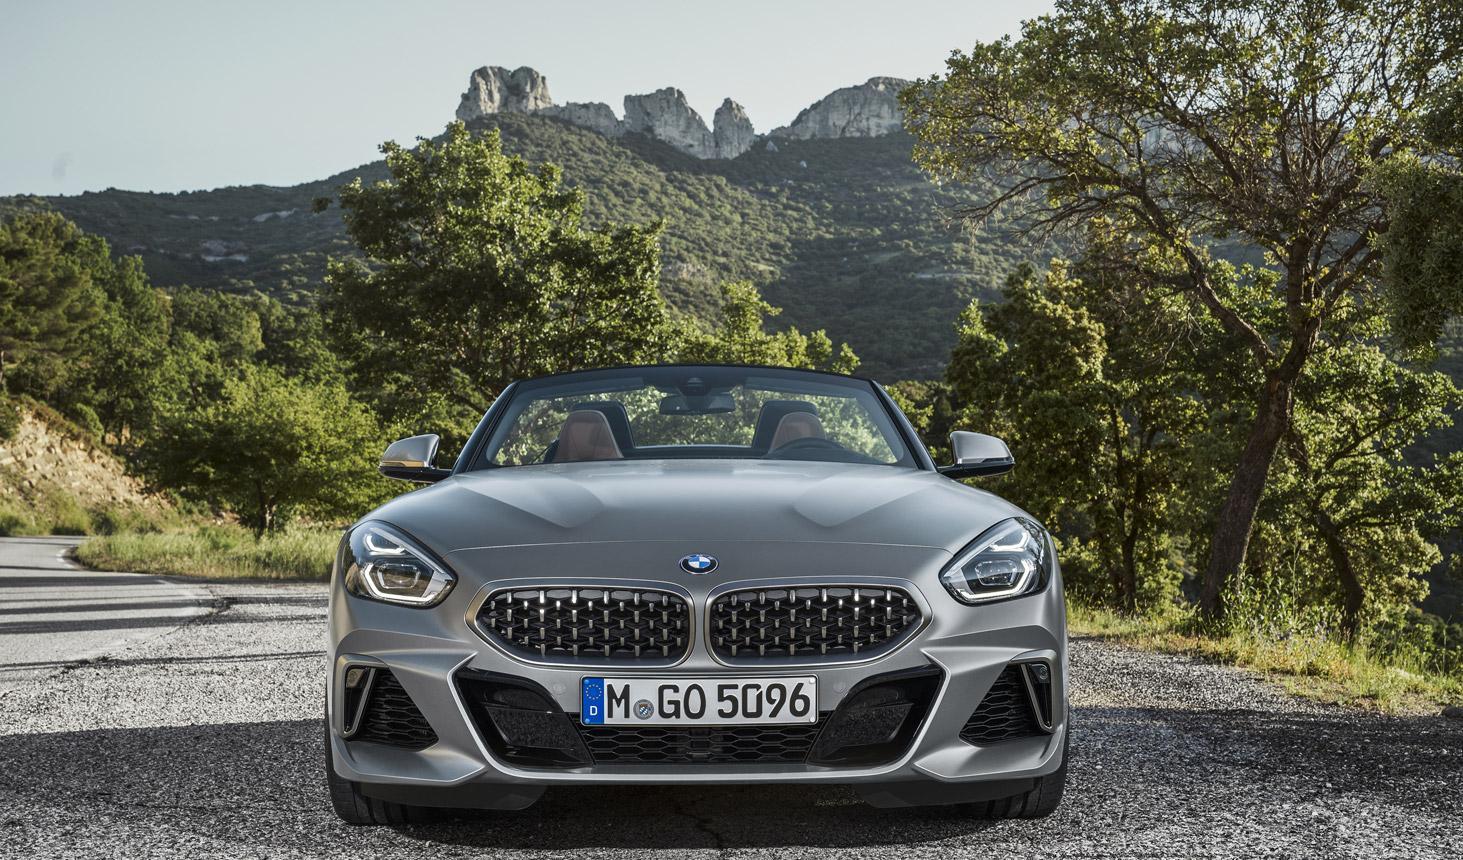 4-fiche-occasion-BMW-Z4-G29-fiabilite-guide-achat.jpeg